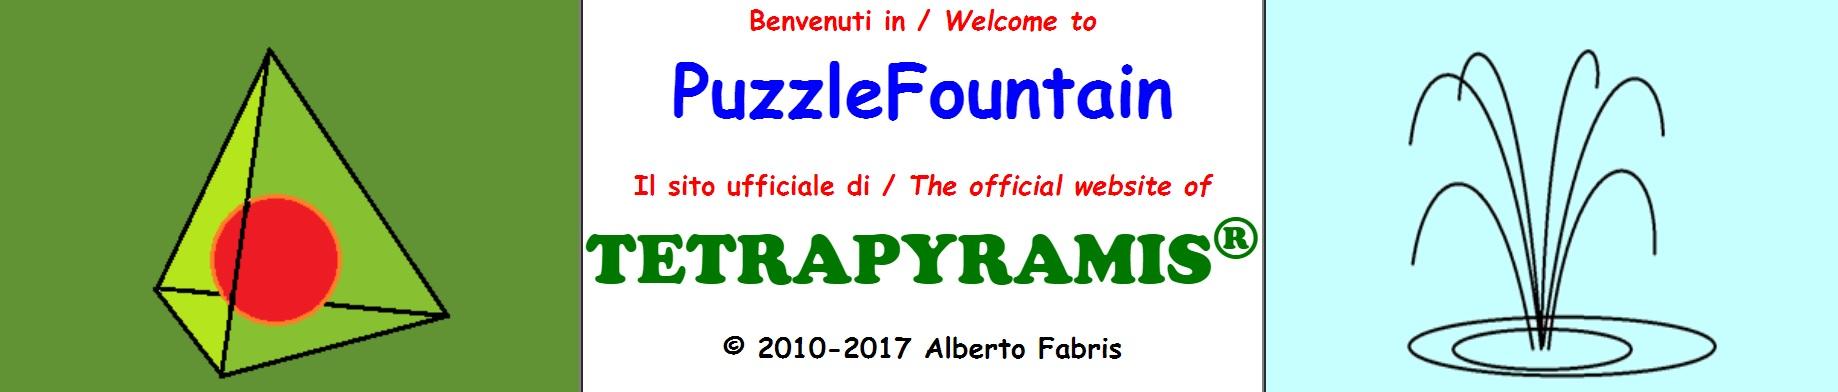 puzzlefontain banner.jpg